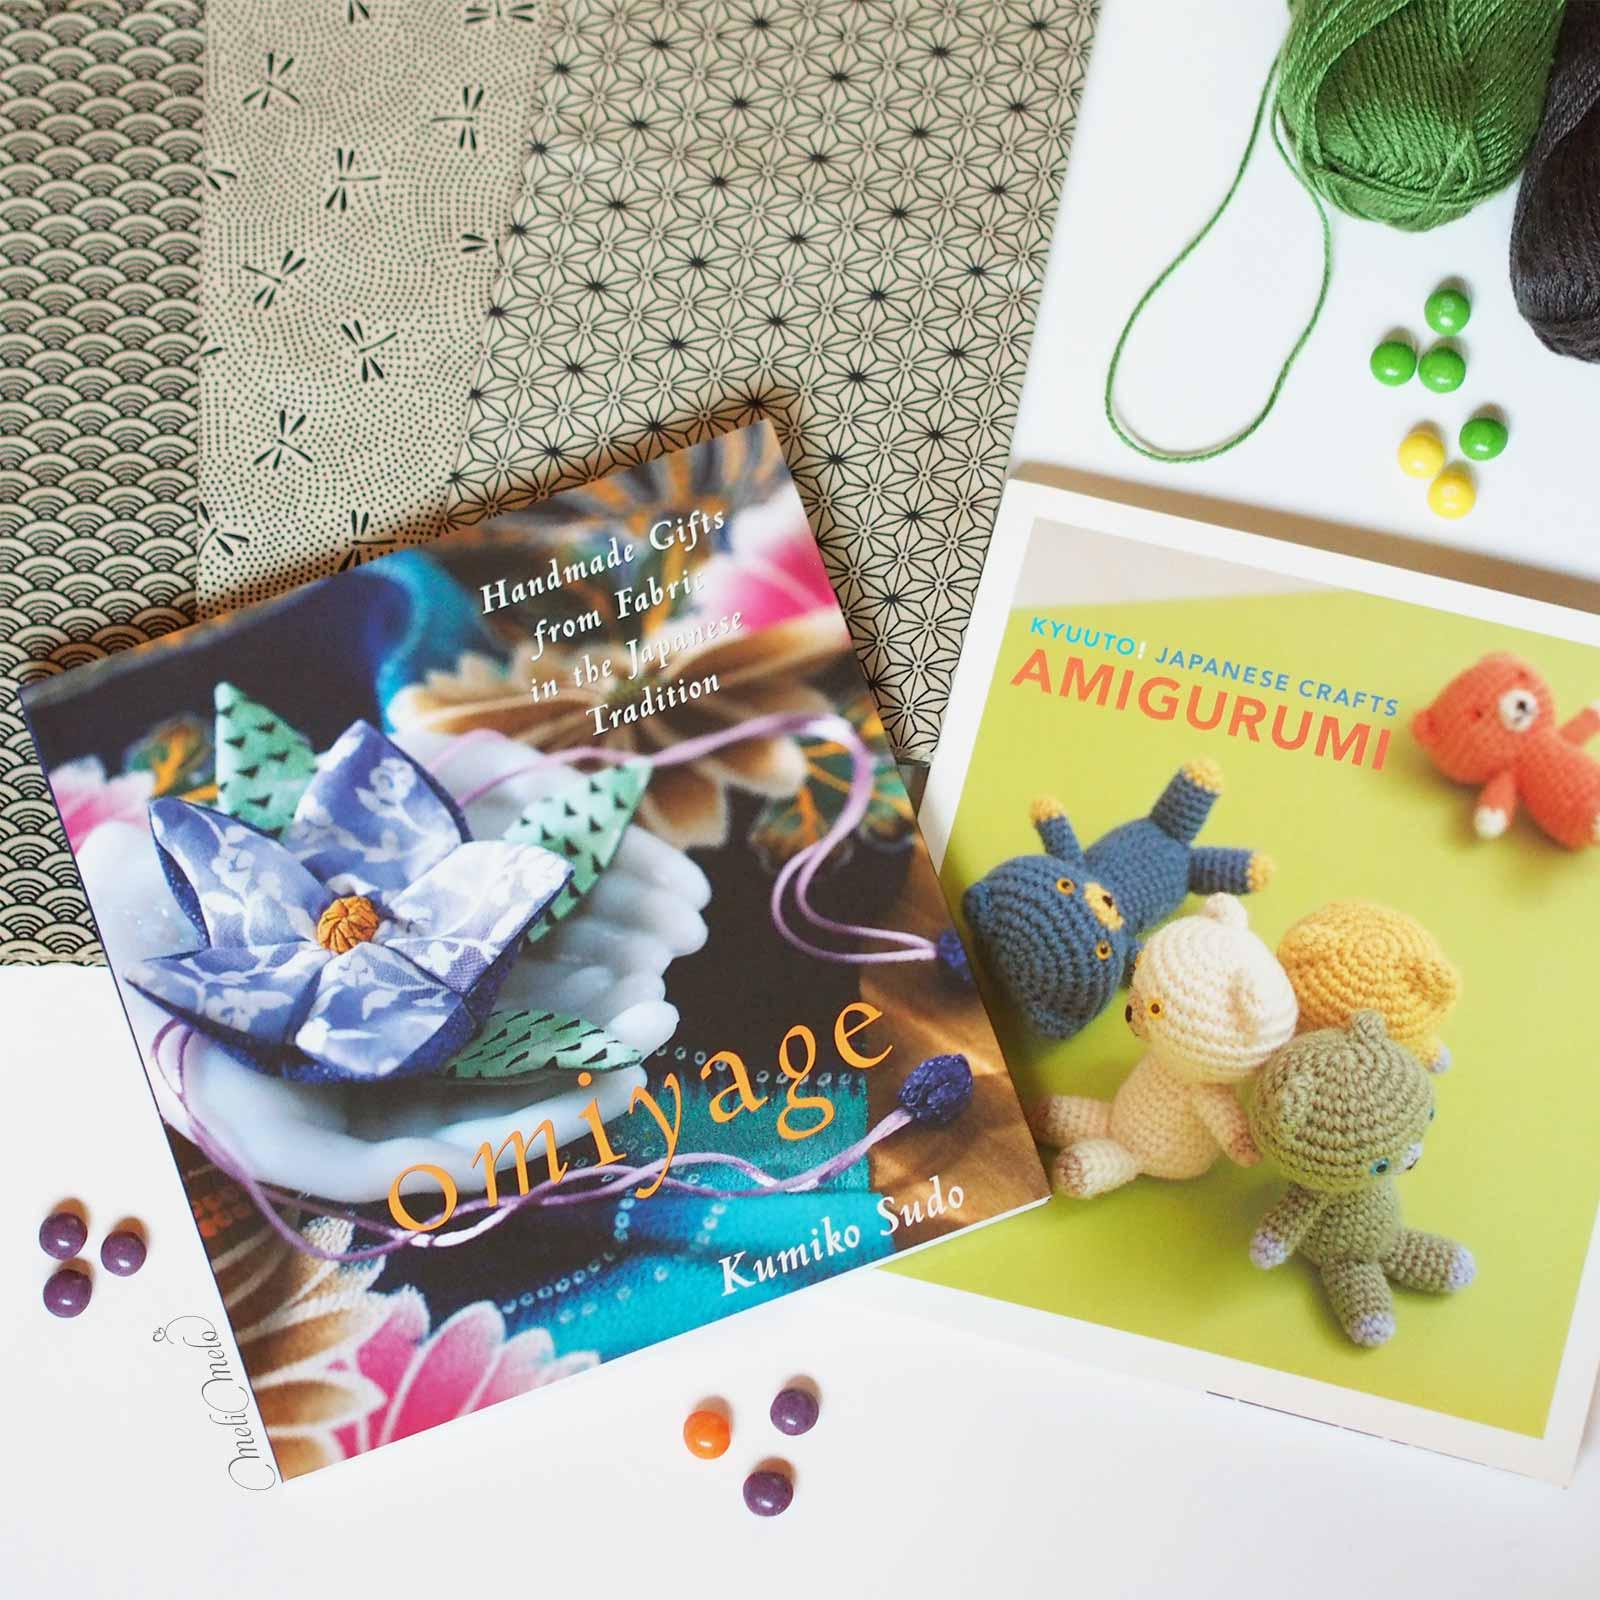 livres crochet amigurumi omiyage crafts japonais laboutiquedemelimelo